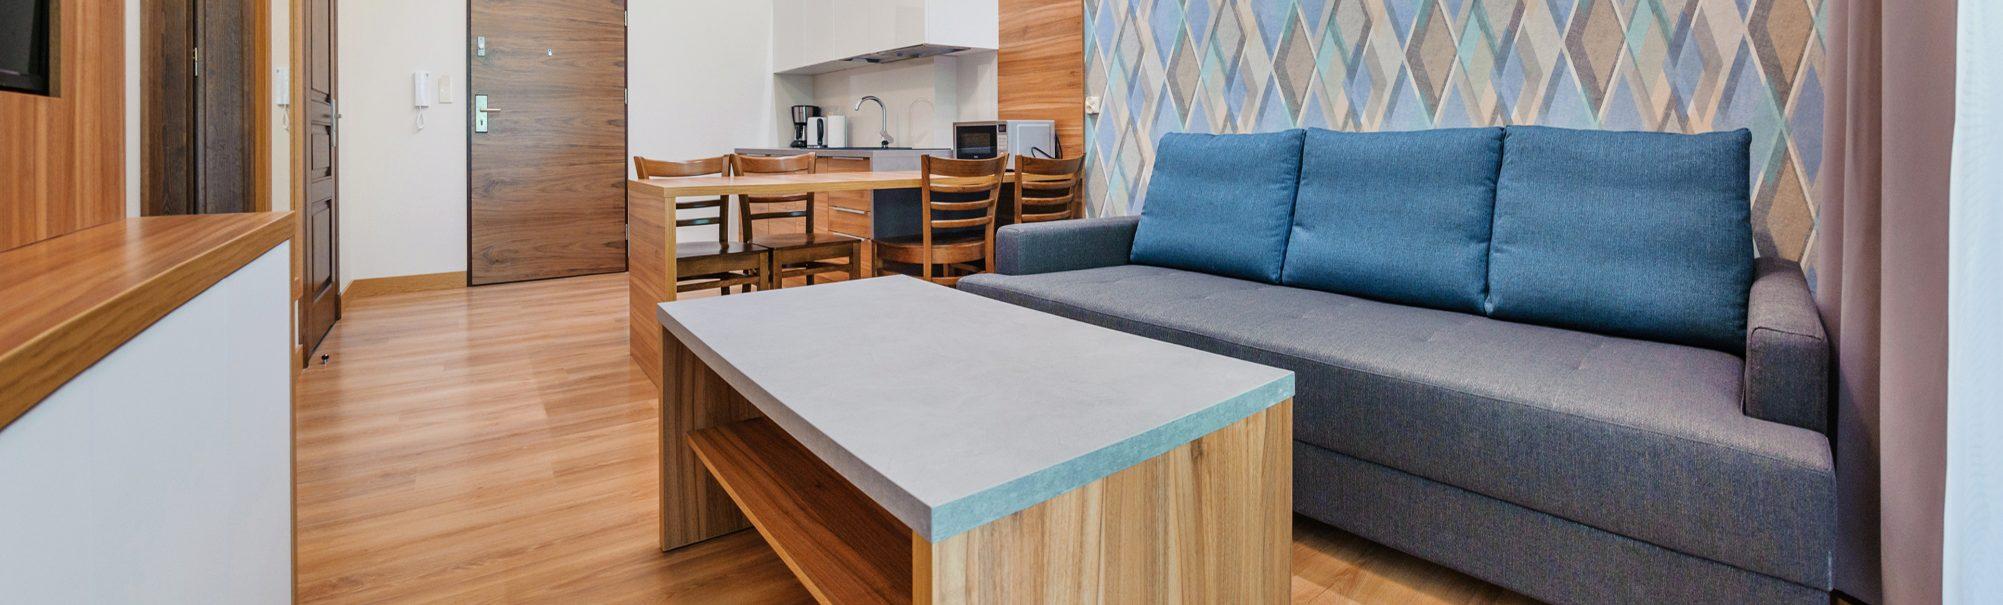 Apartamenty Sun&Snow Apartament A 37 Hel - Cypel Helski